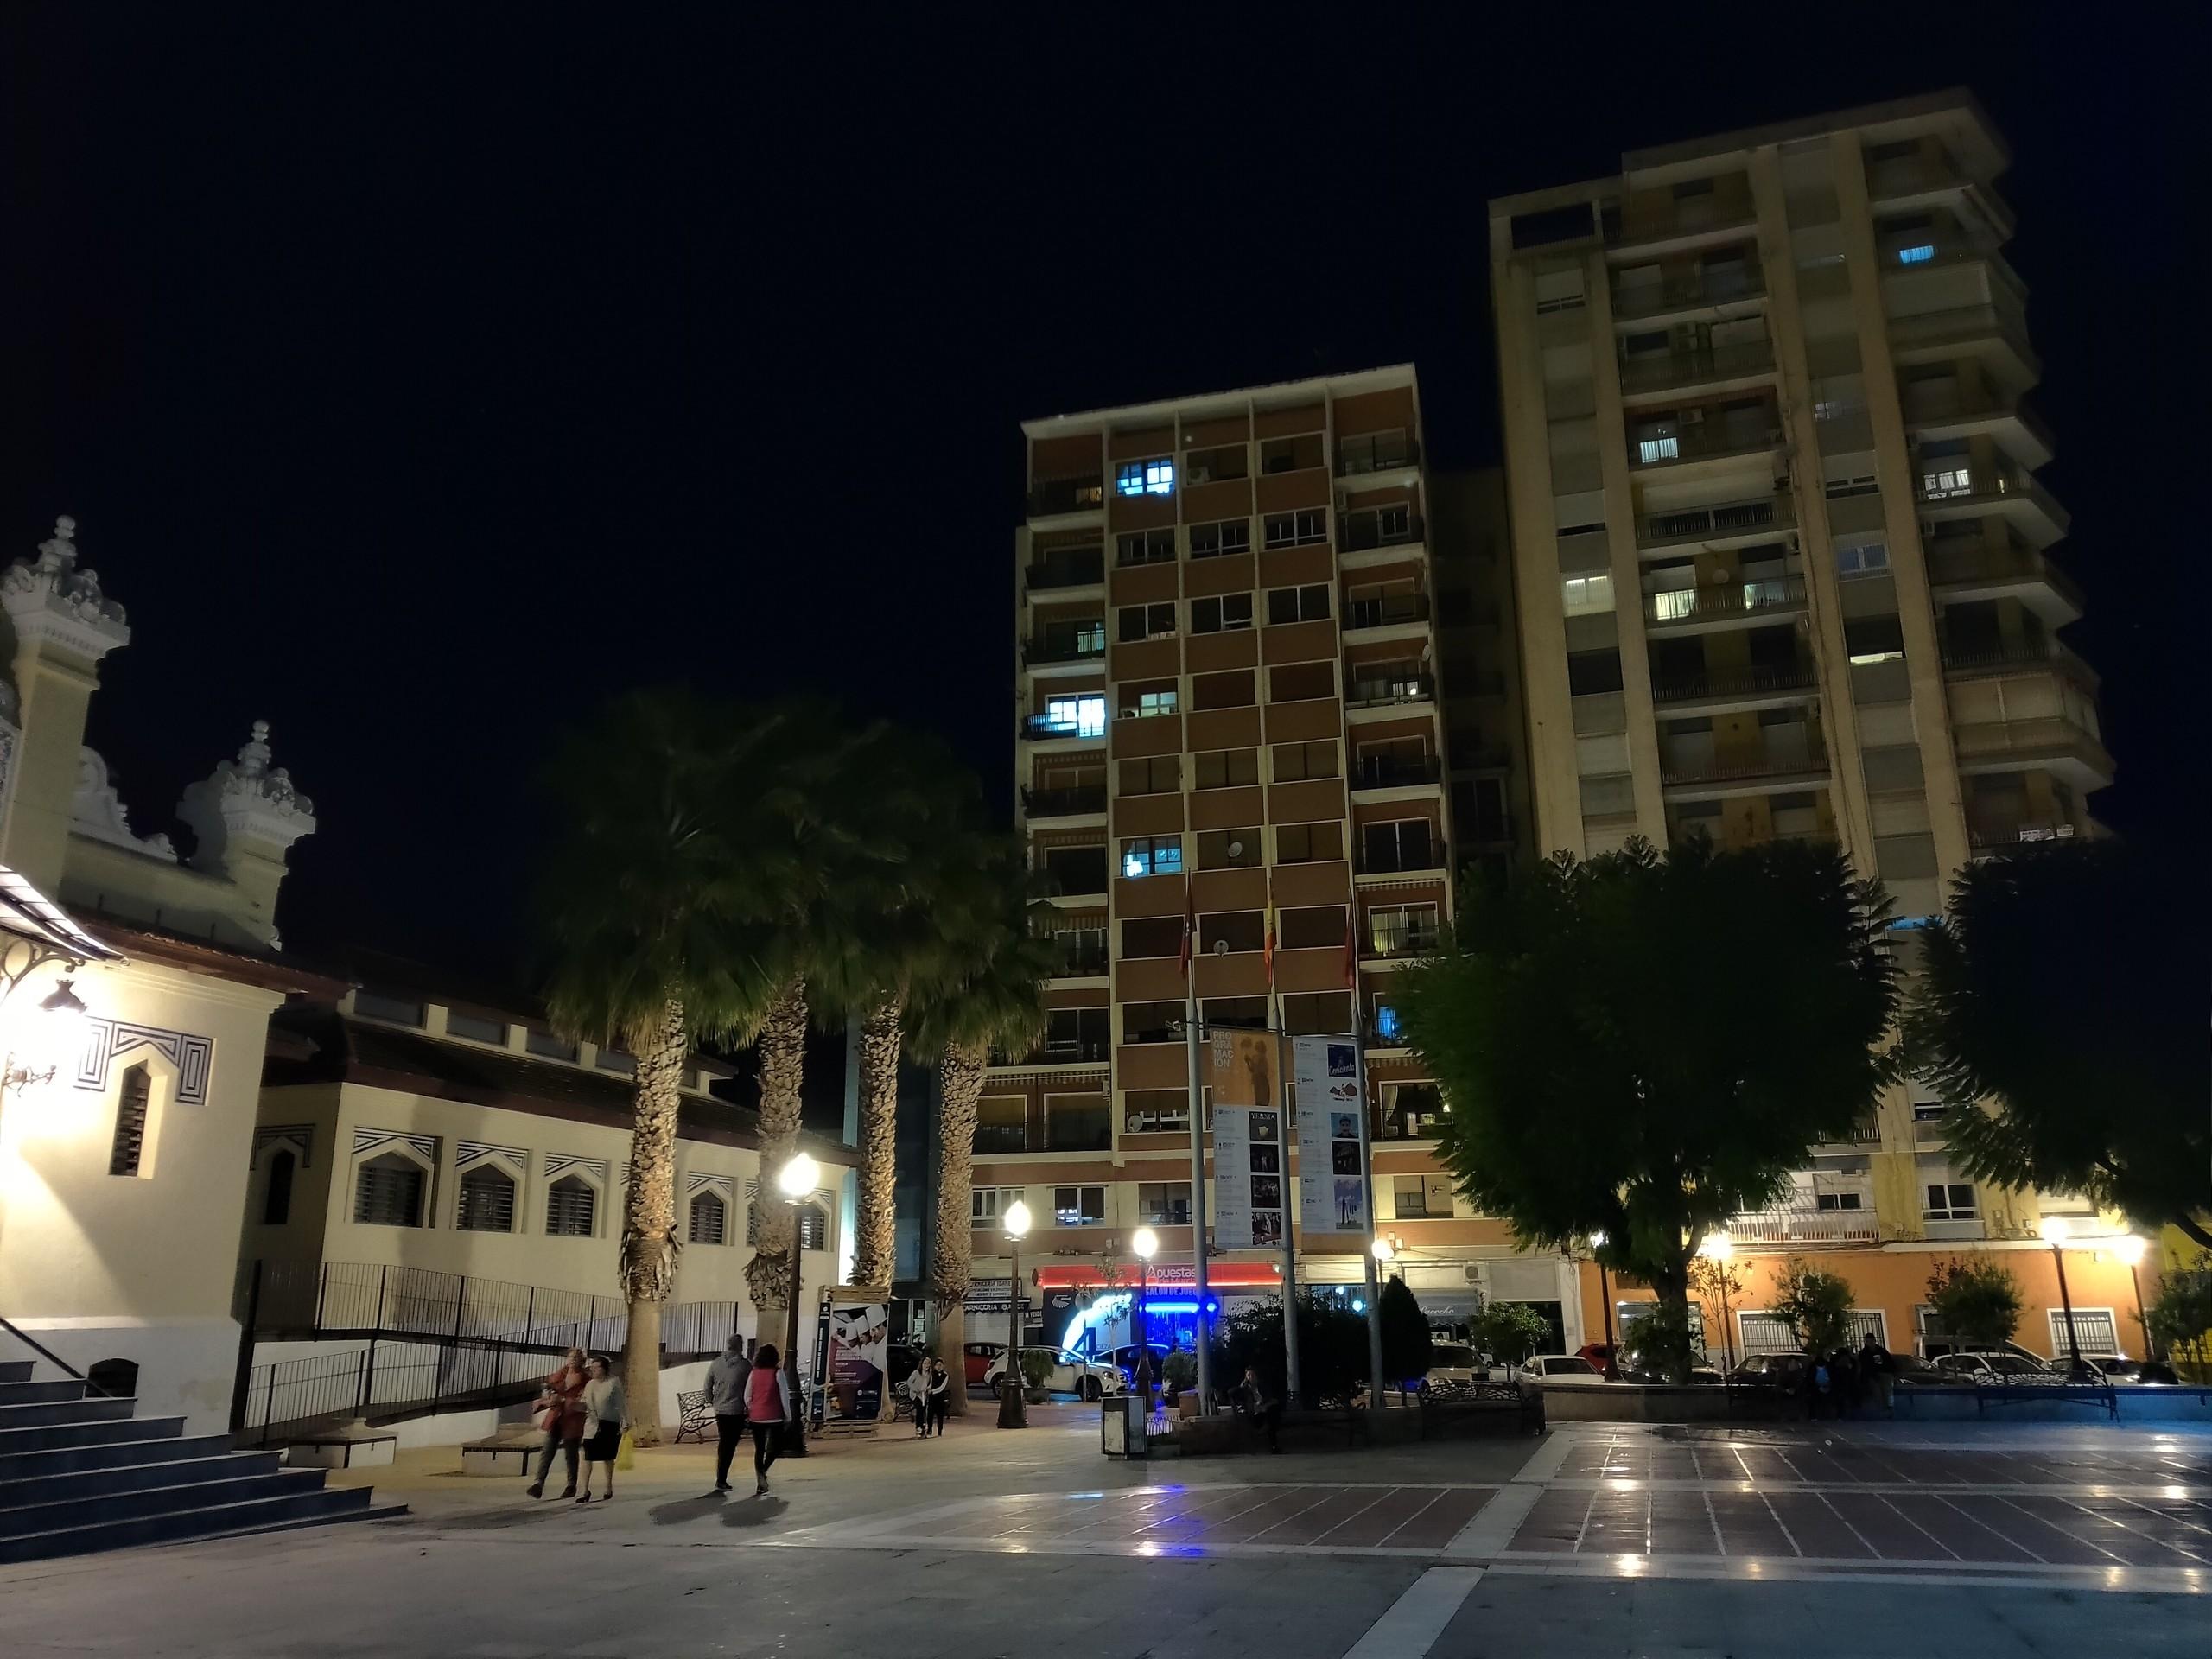 Foto de Cámara del Razer Phone 2 (16/24)